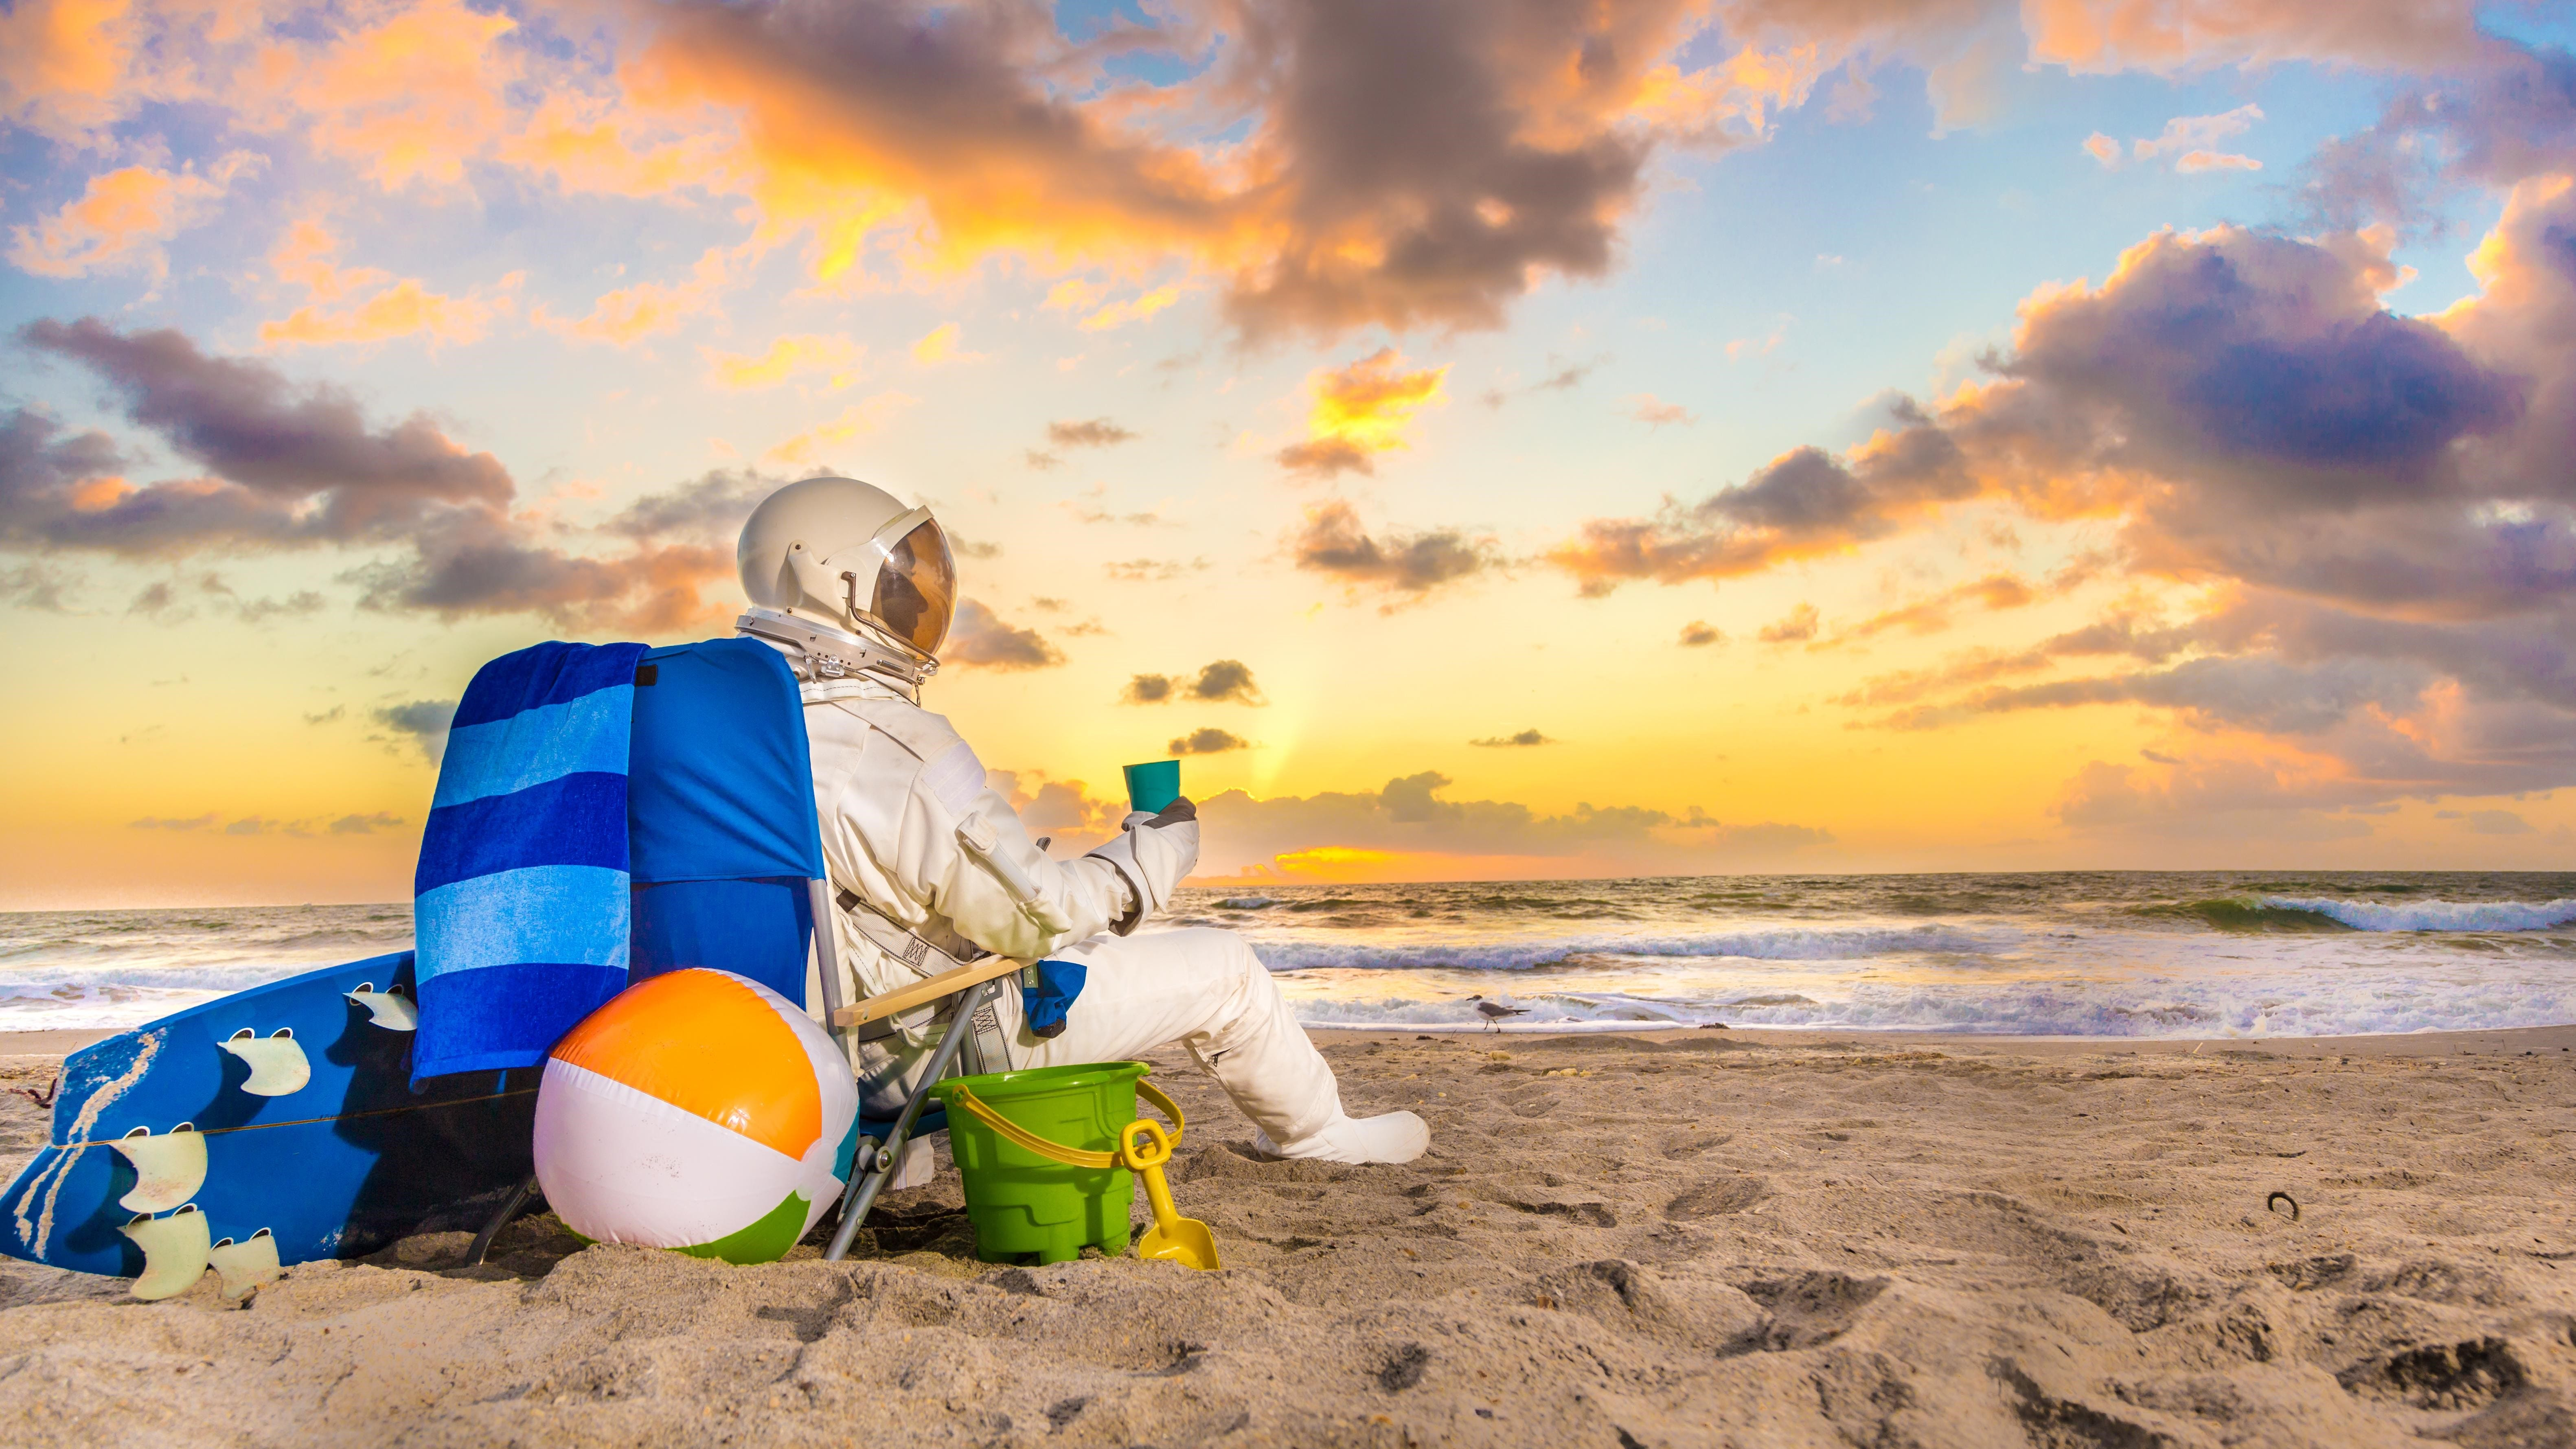 $1M Space Coast tourism campaign targets Miami